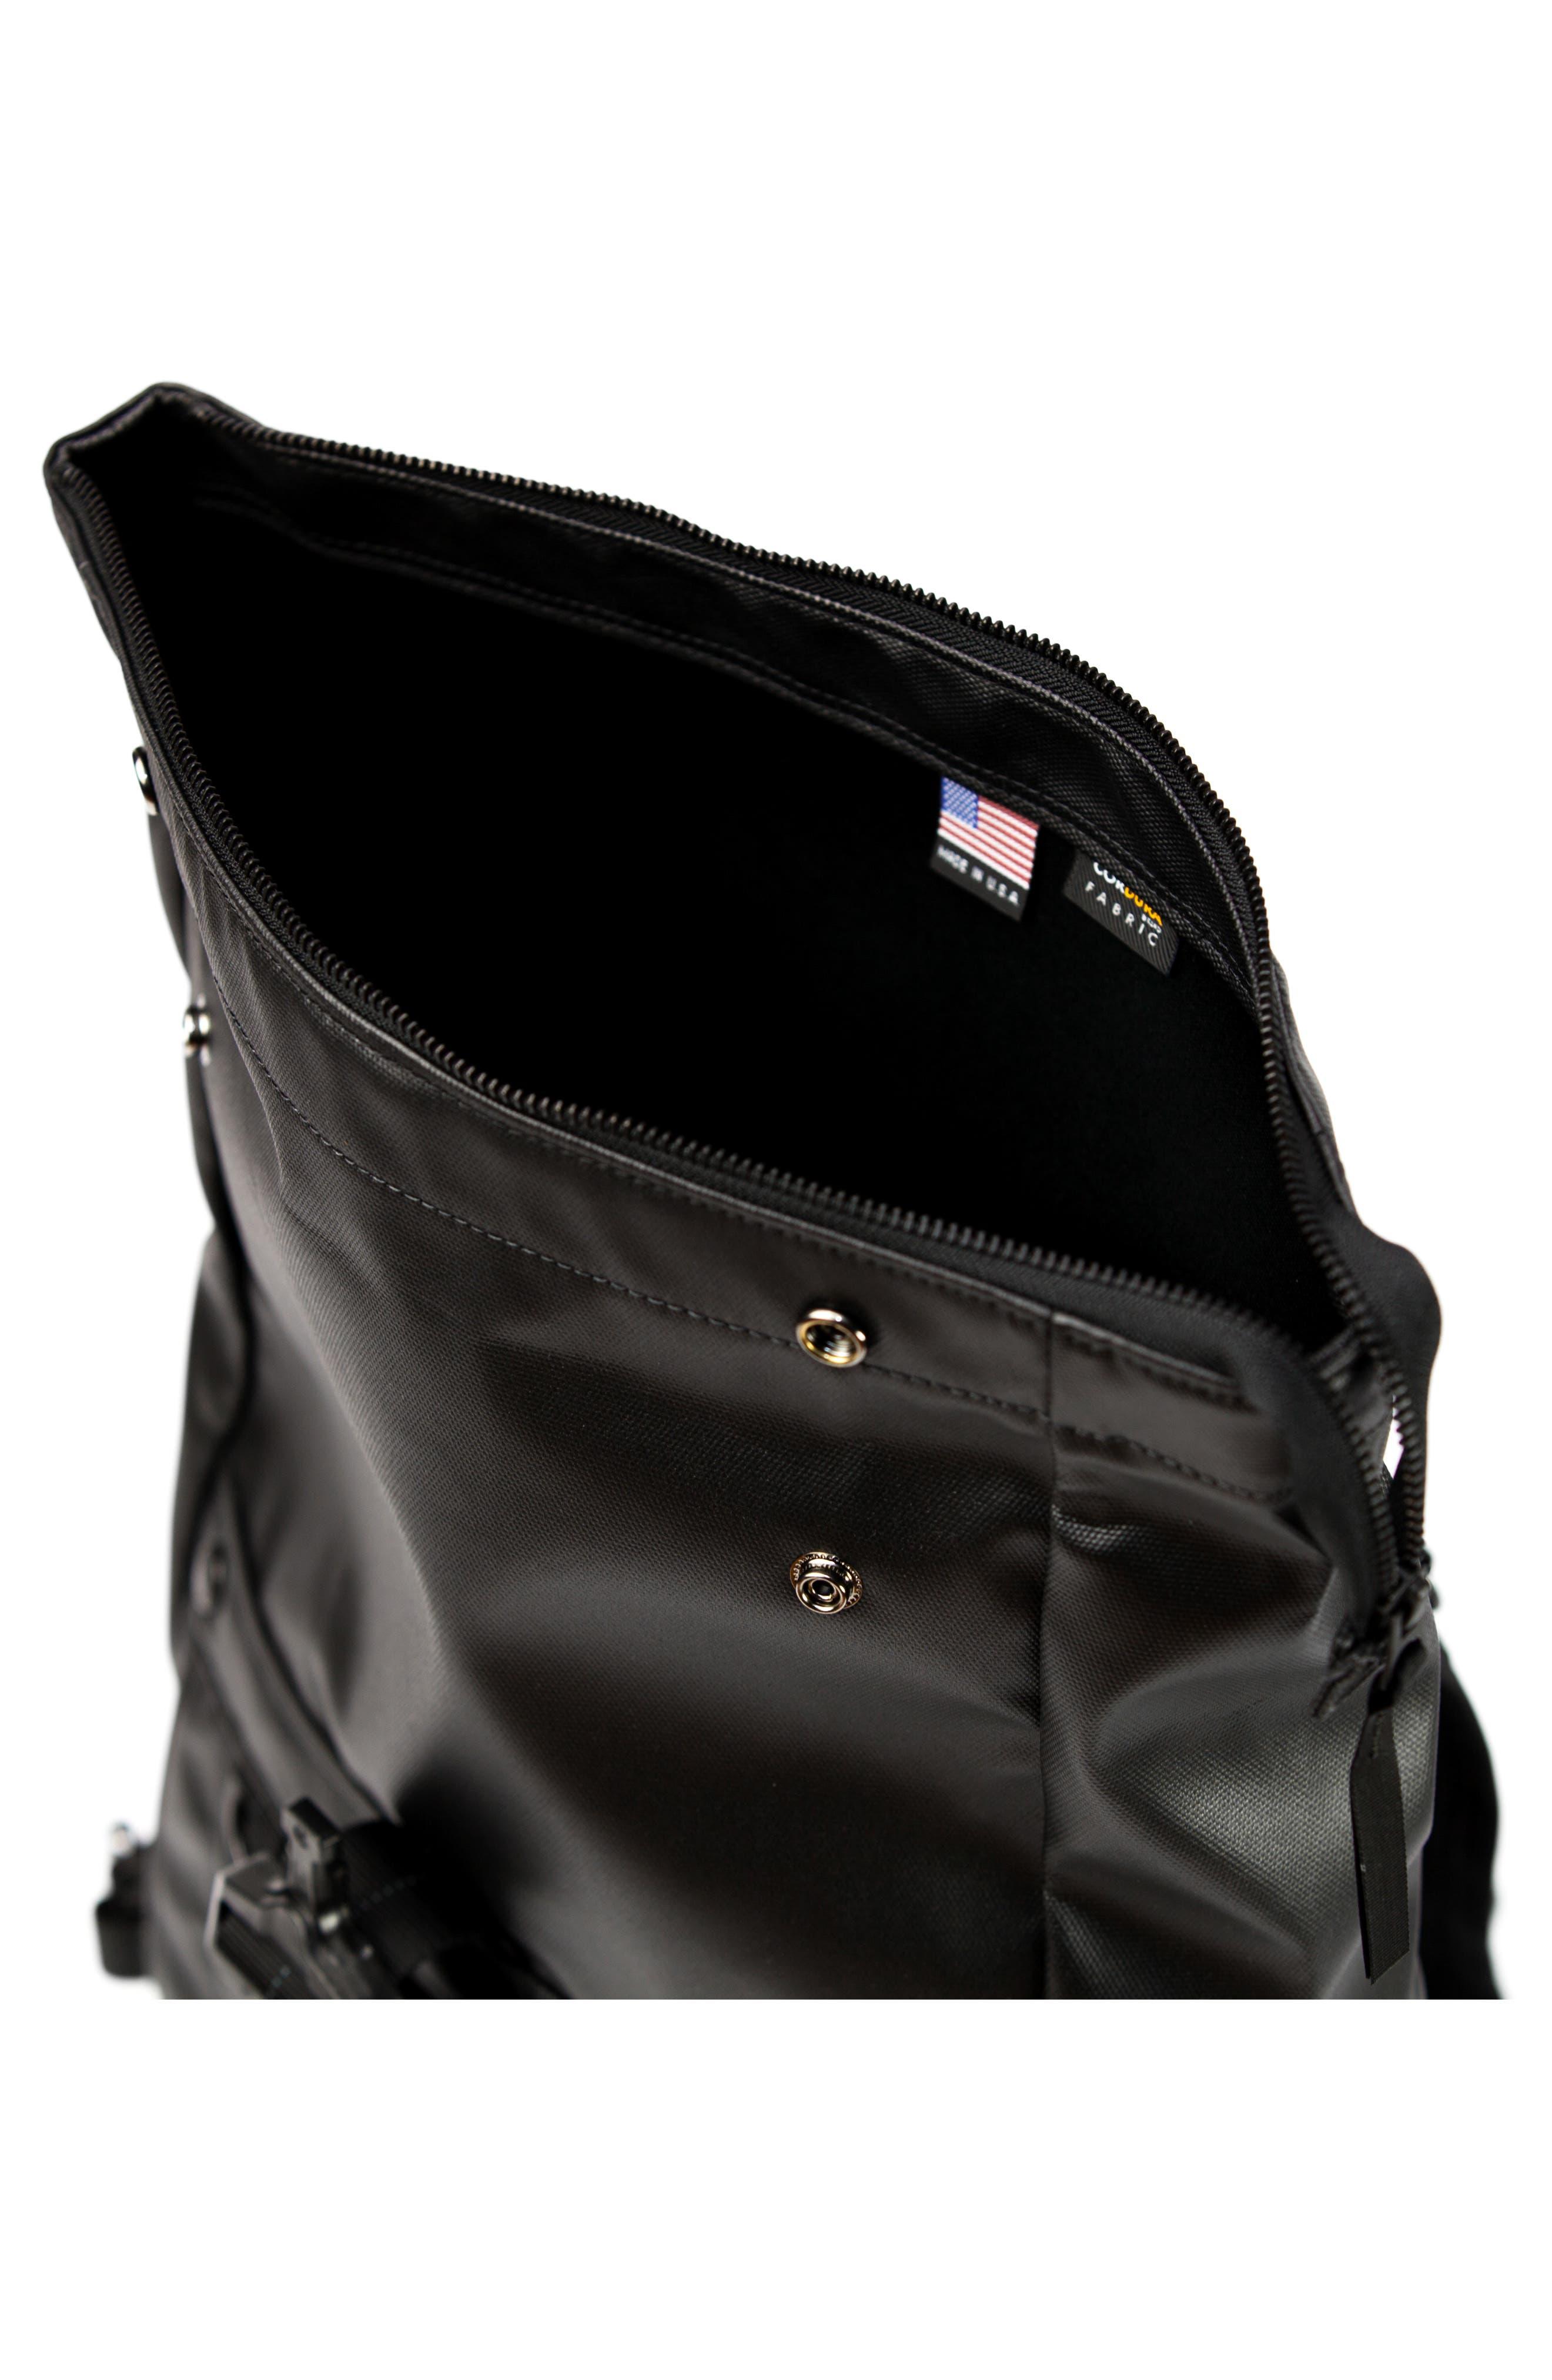 NightHawk Roll Top Backpack,                             Alternate thumbnail 4, color,                             BLACK